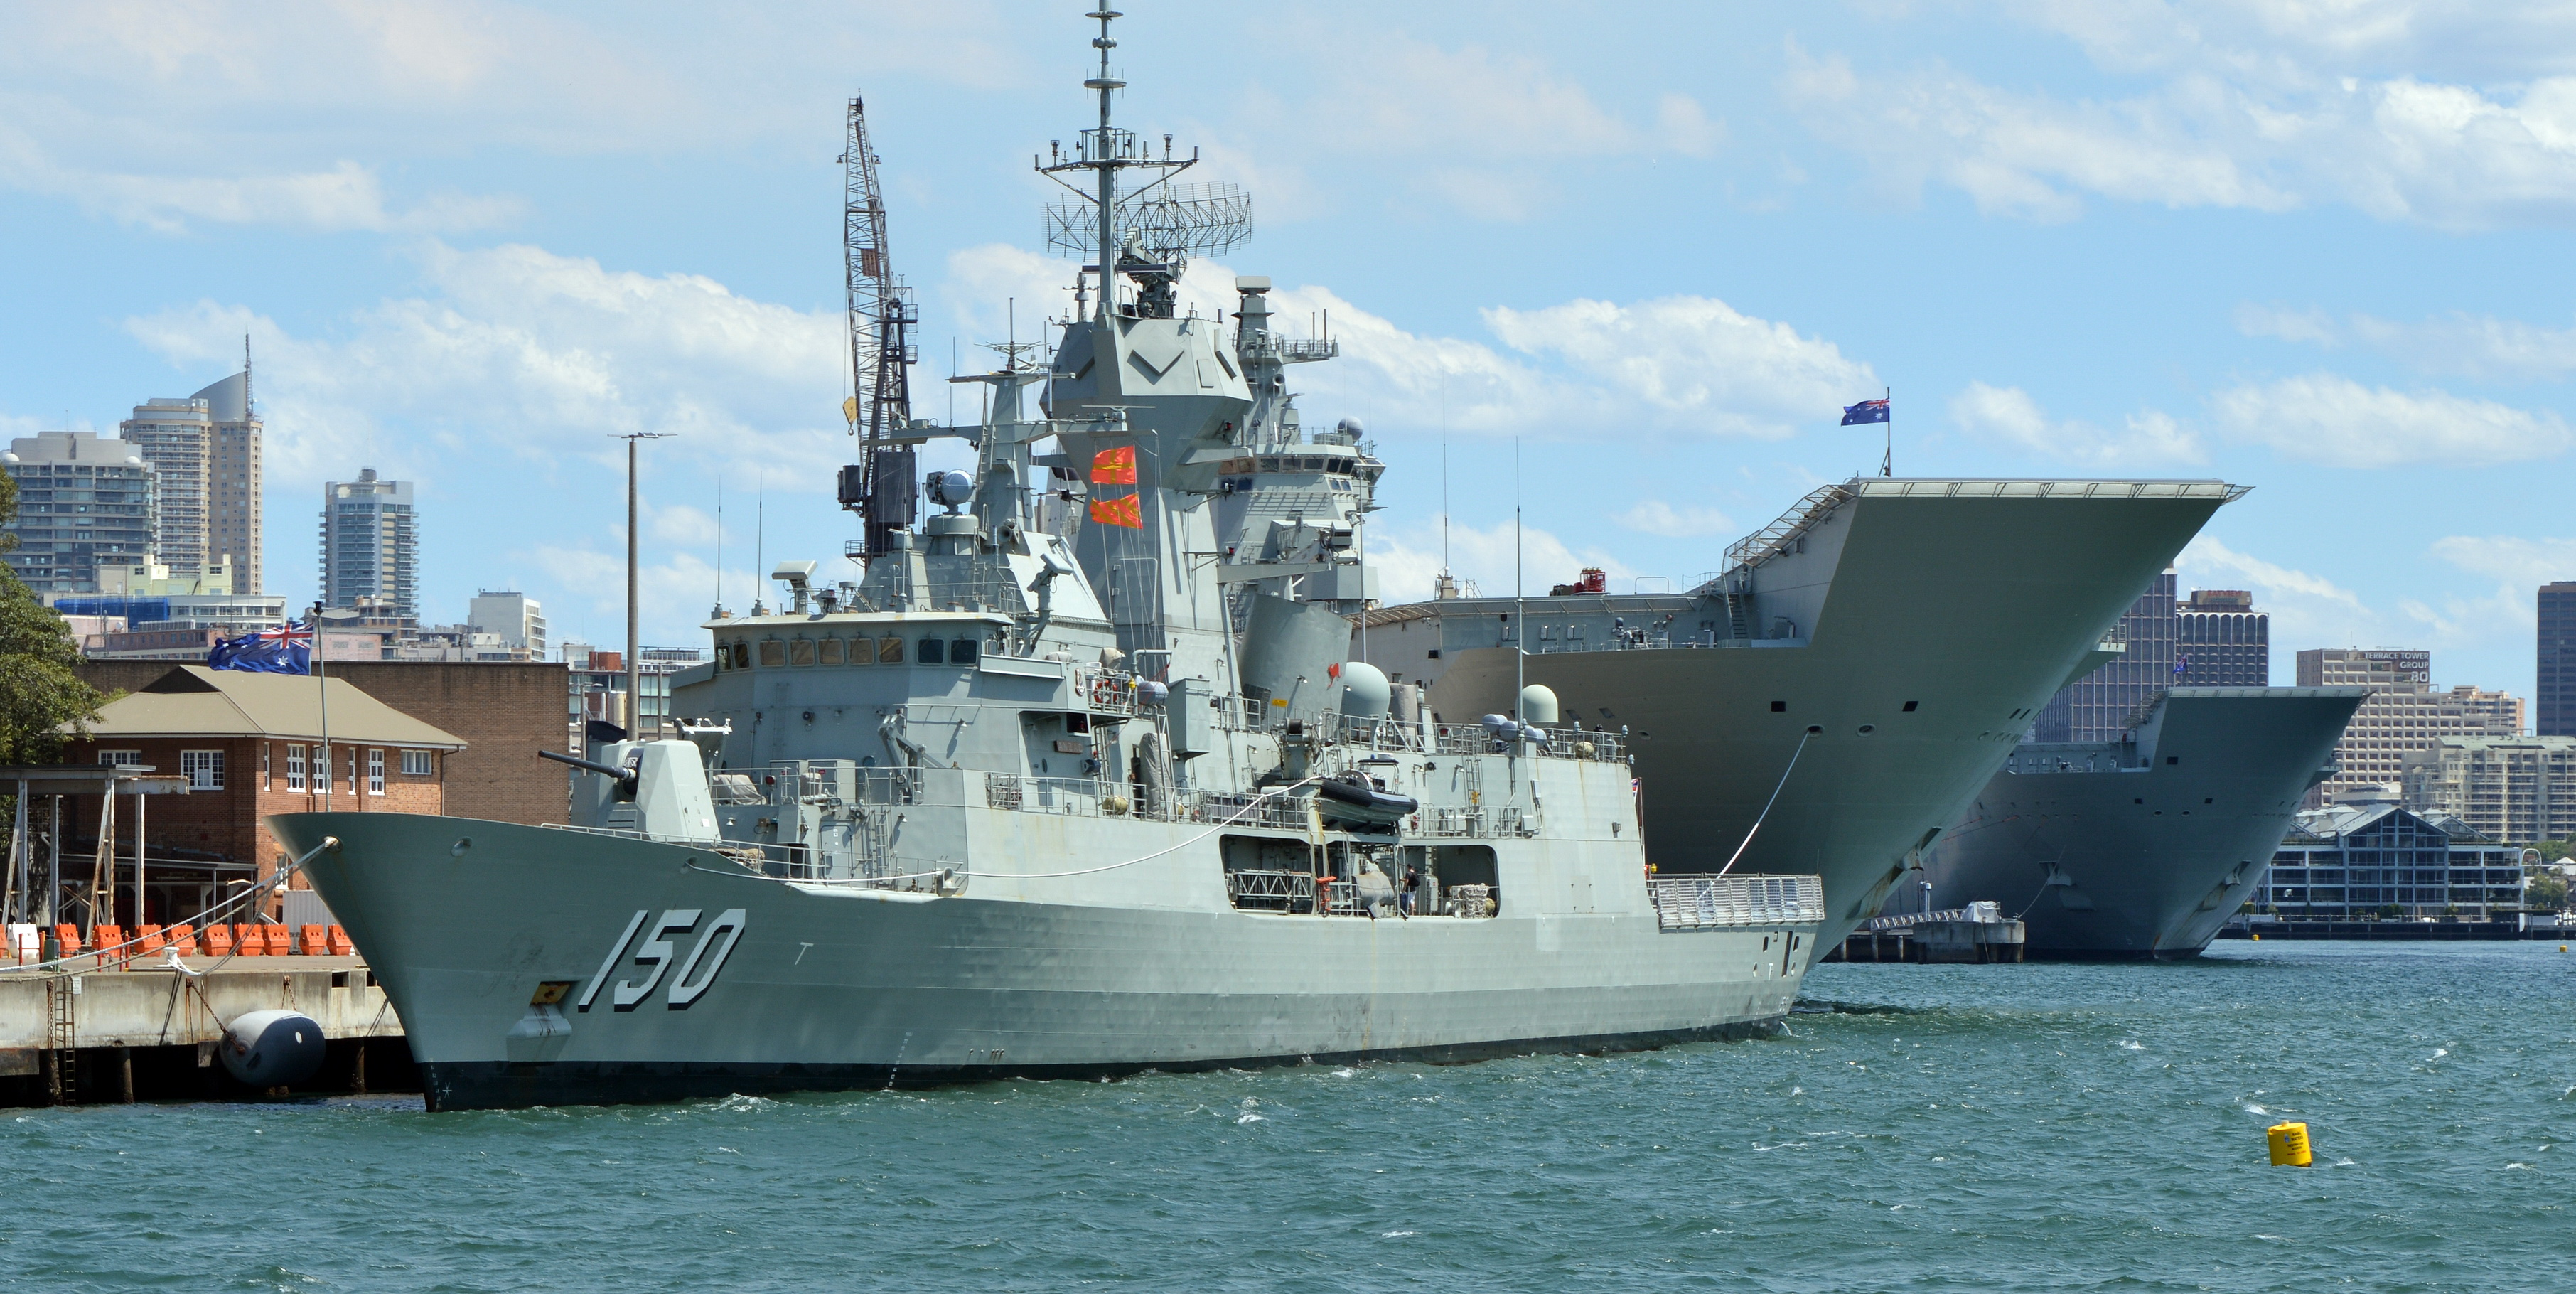 Australian Navy - Marine Australienne - Page 4 31652987291_57b10c699d_o